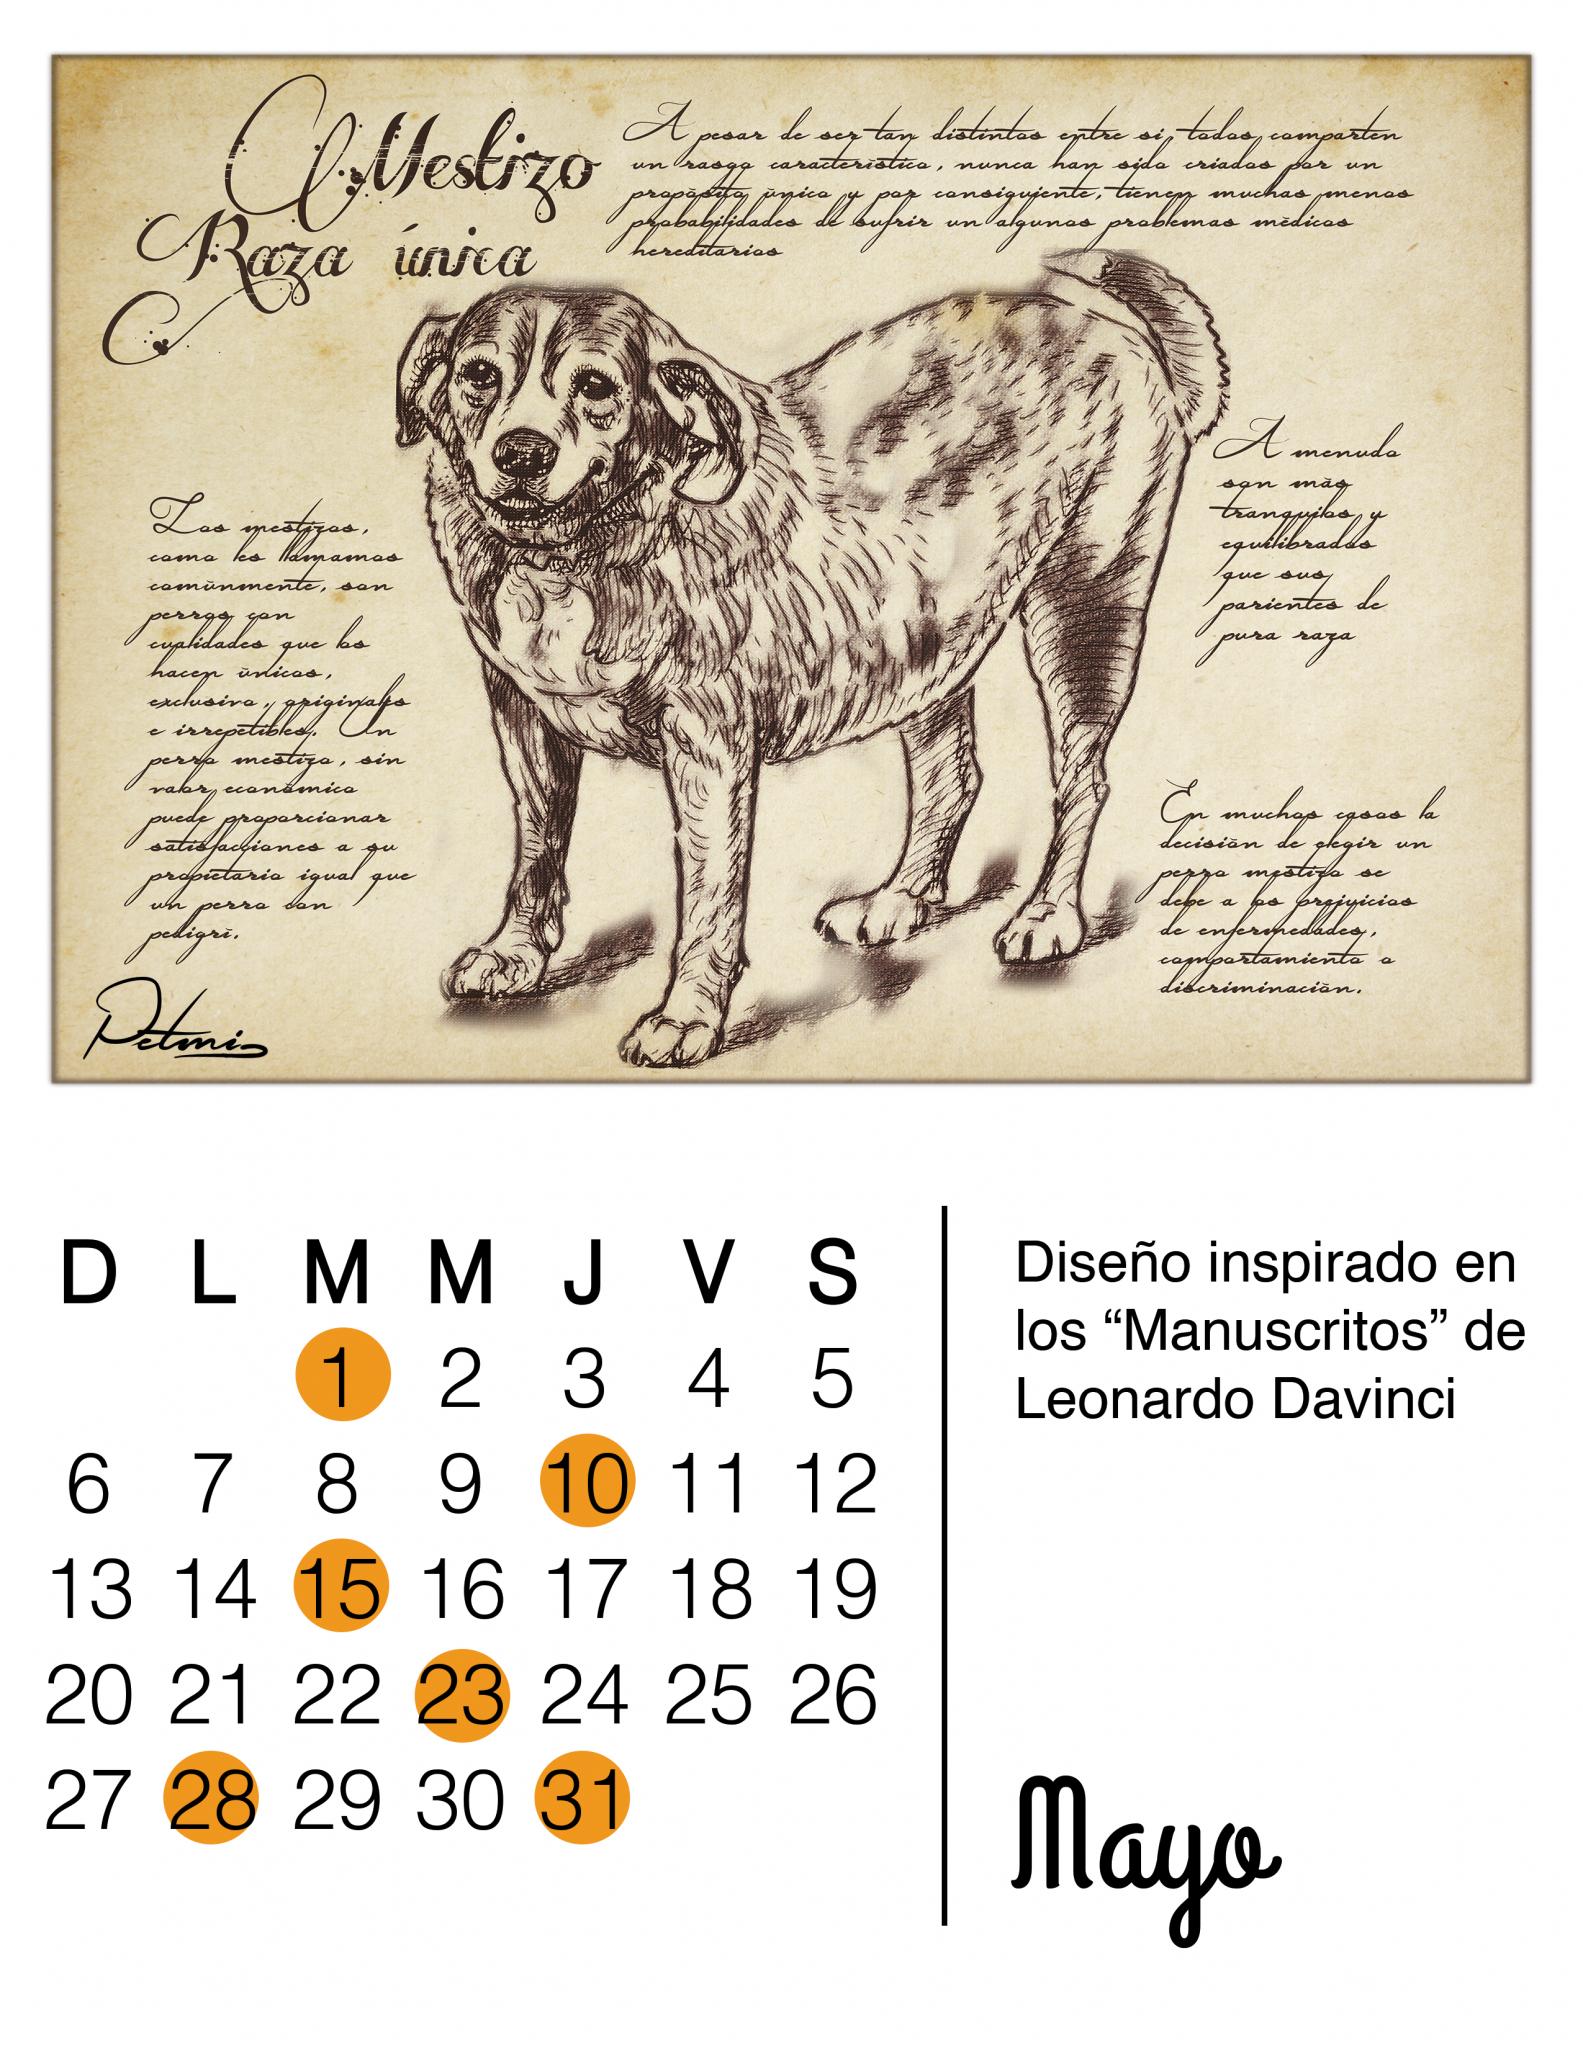 Calendario Perruno.Calendario Petmi 2018 Fechas Importantes Para Las Mascotas